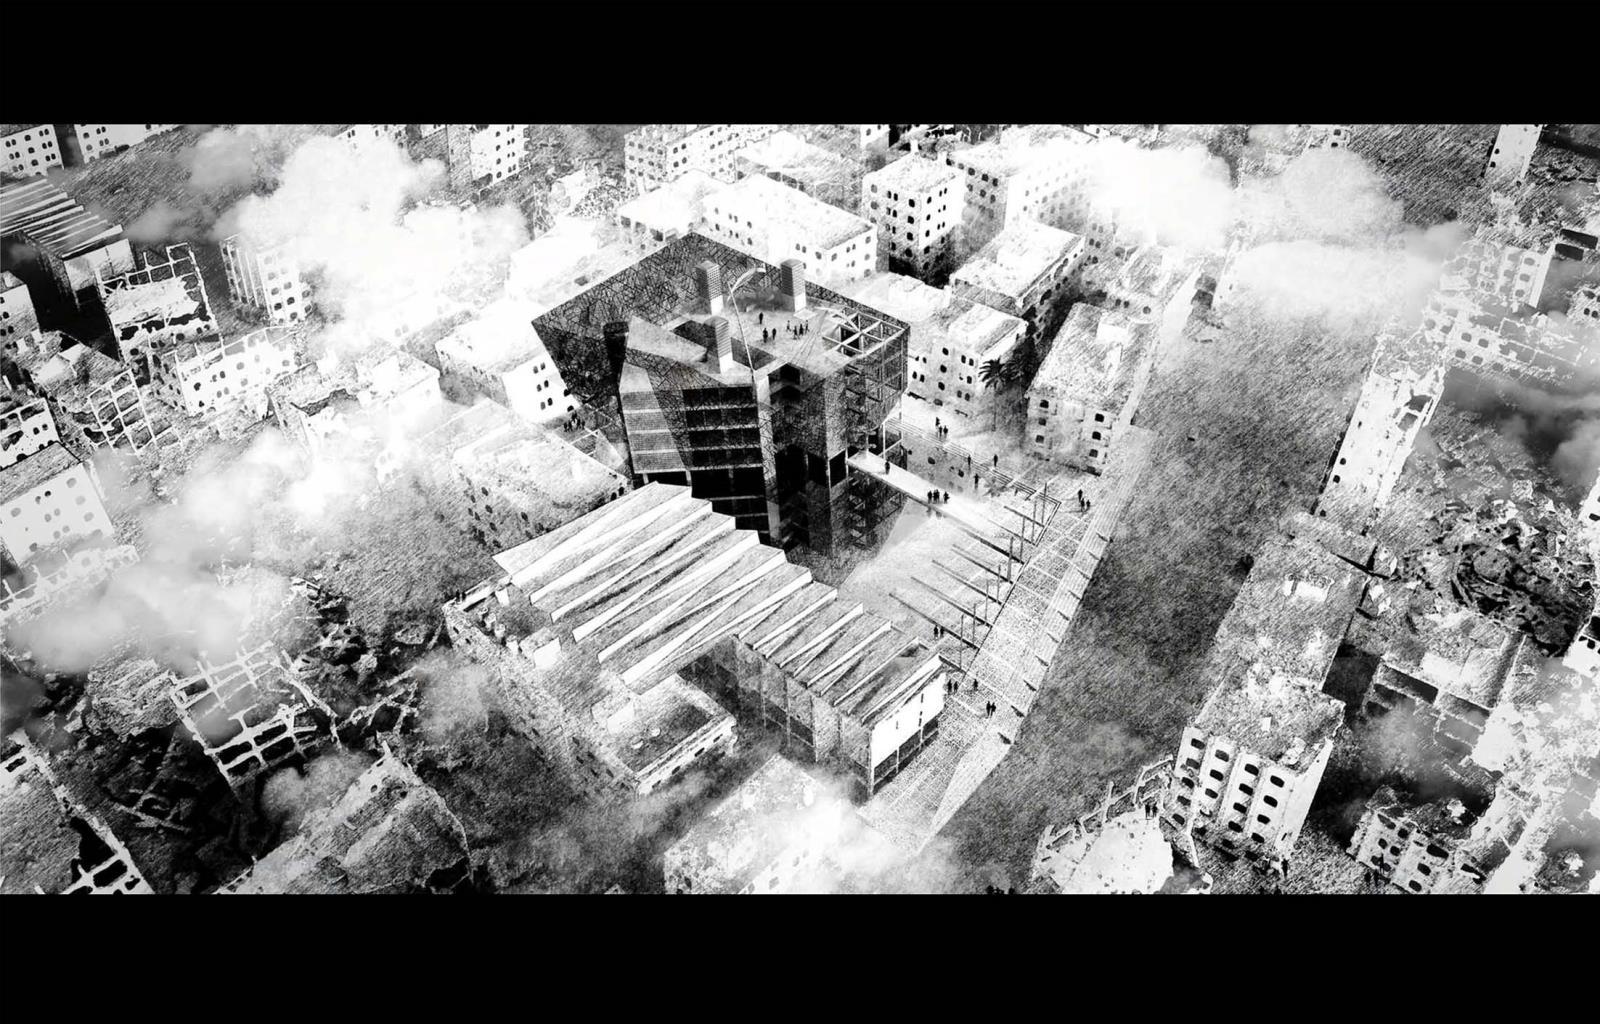 #Gazagram : Redevelopment & Innovation In The Finite City